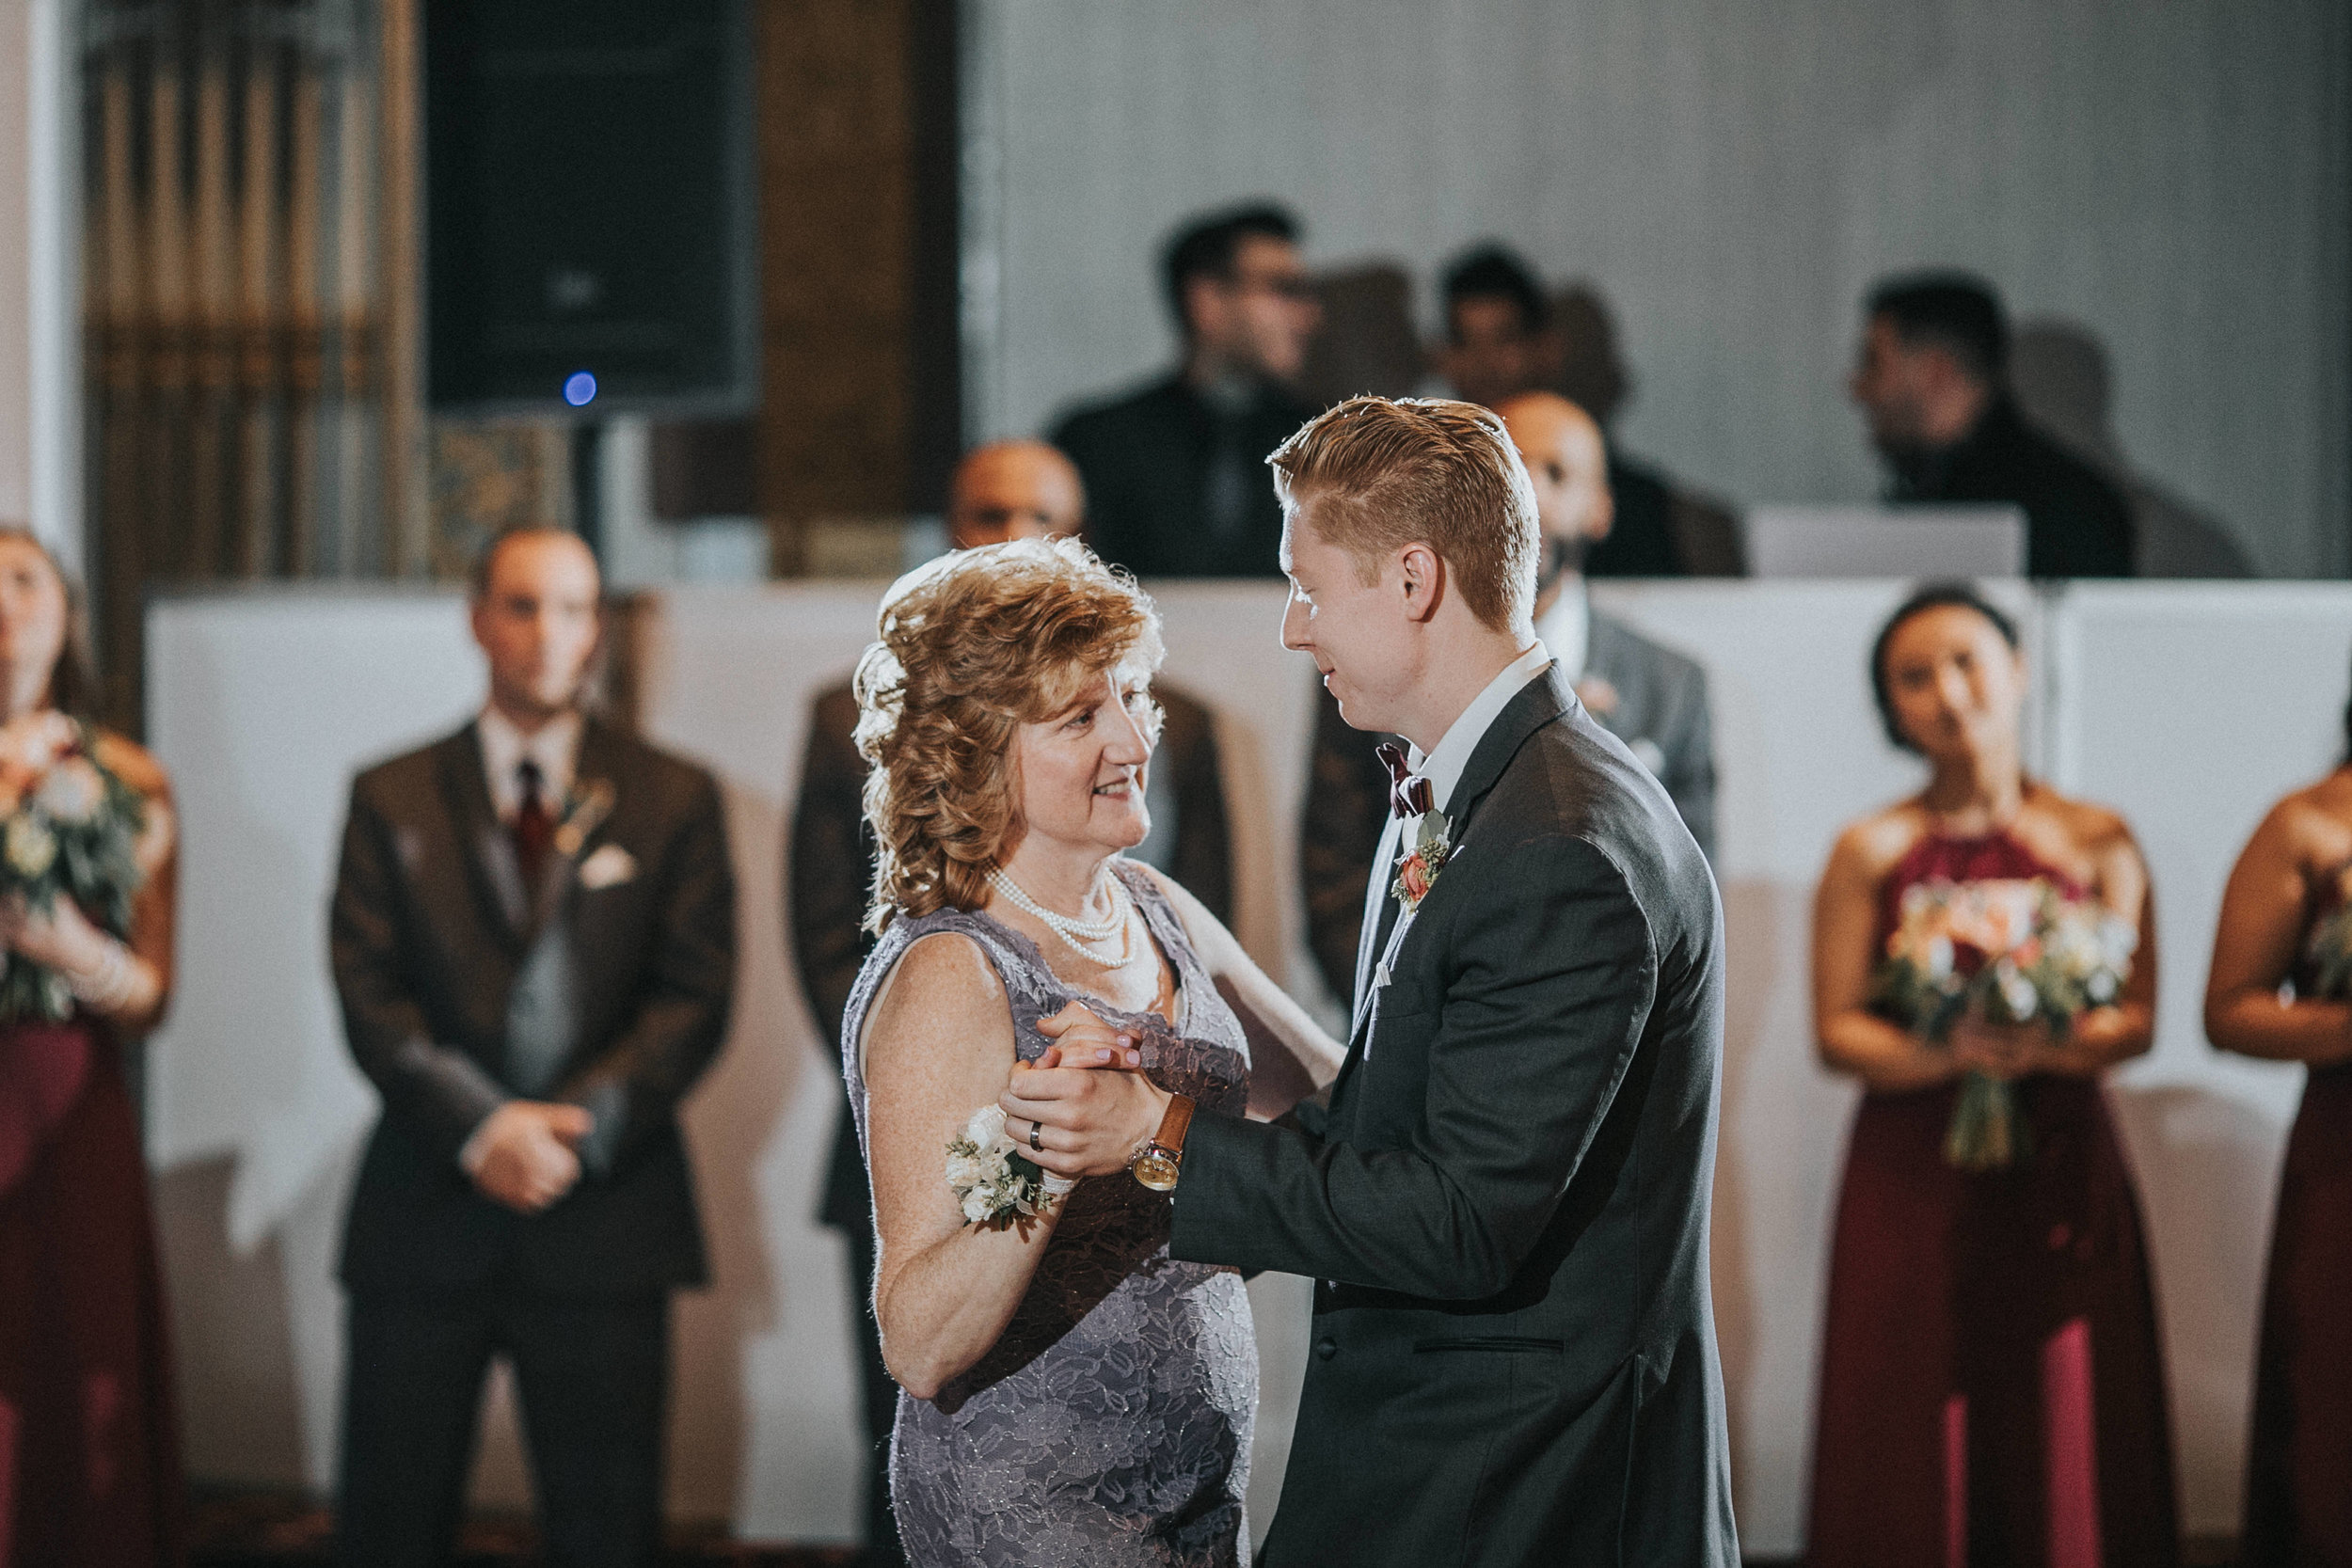 New-Jersey-Wedding-Photography-Fishers-Tudor-House-JennaLynnPhotography-Reception-Kathleen&Eddie-114.jpg